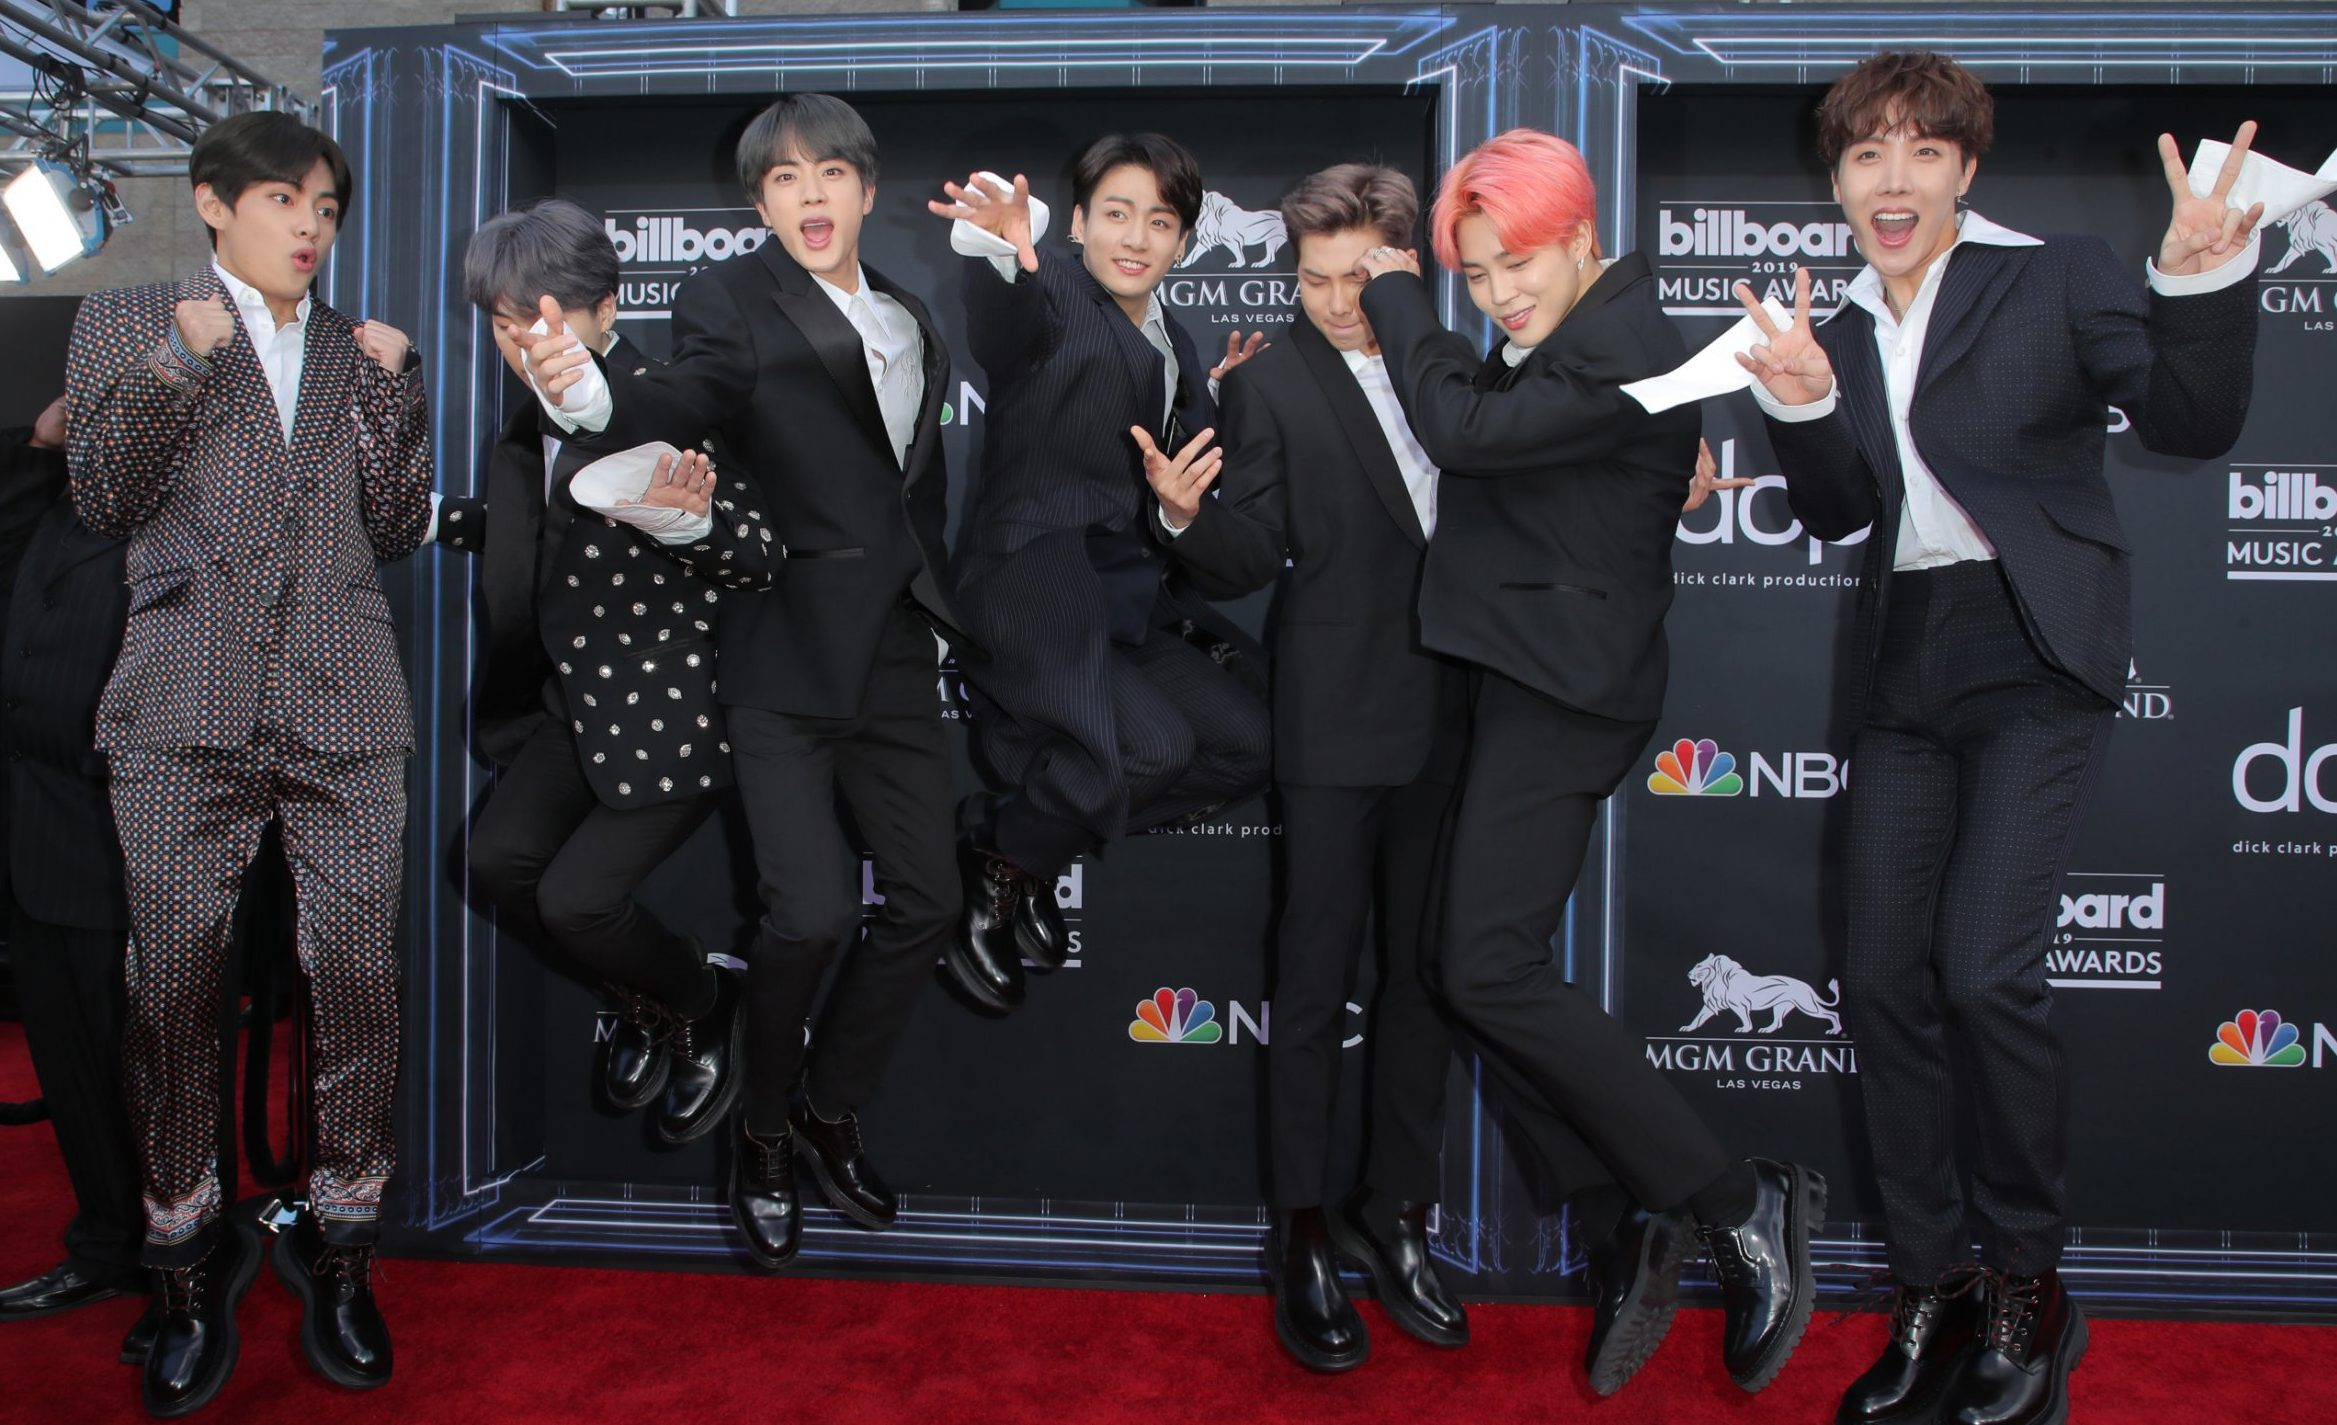 Mandatory Credit: Photo by Chelsea Lauren/REX (10222623aw) BTS Billboard Music Awards, Arrivals, MGM Grand Garden Arena, Las Vegas, USA - 01 May 2019